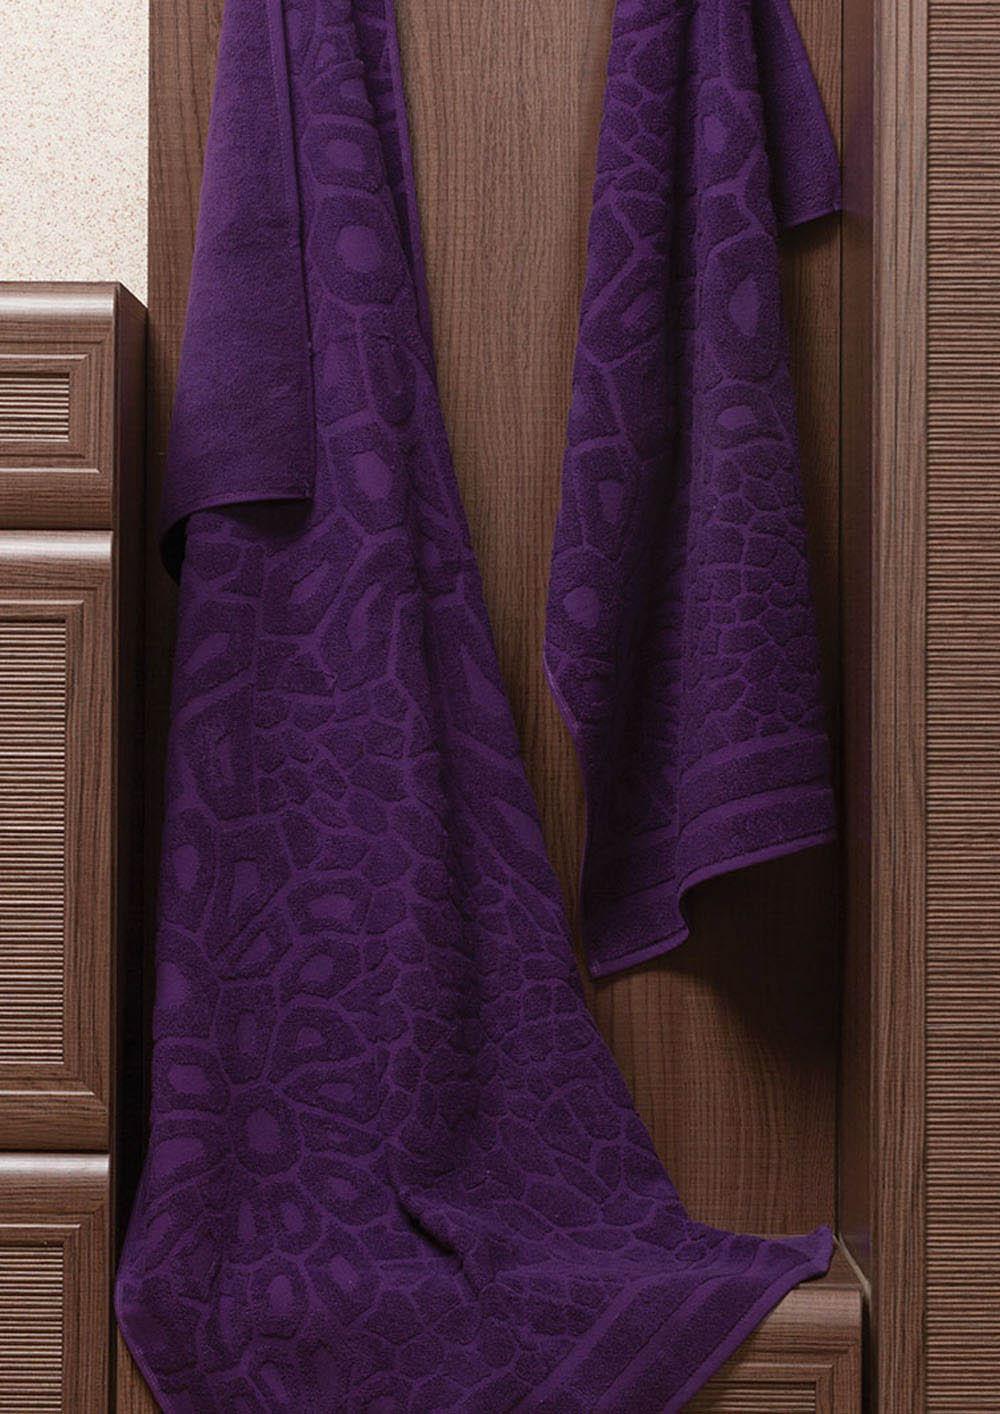 Полотенца Primavelle Полотенце Полотенце Цвет: Xетло-Фиолетовый (50х90 см) цена и фото